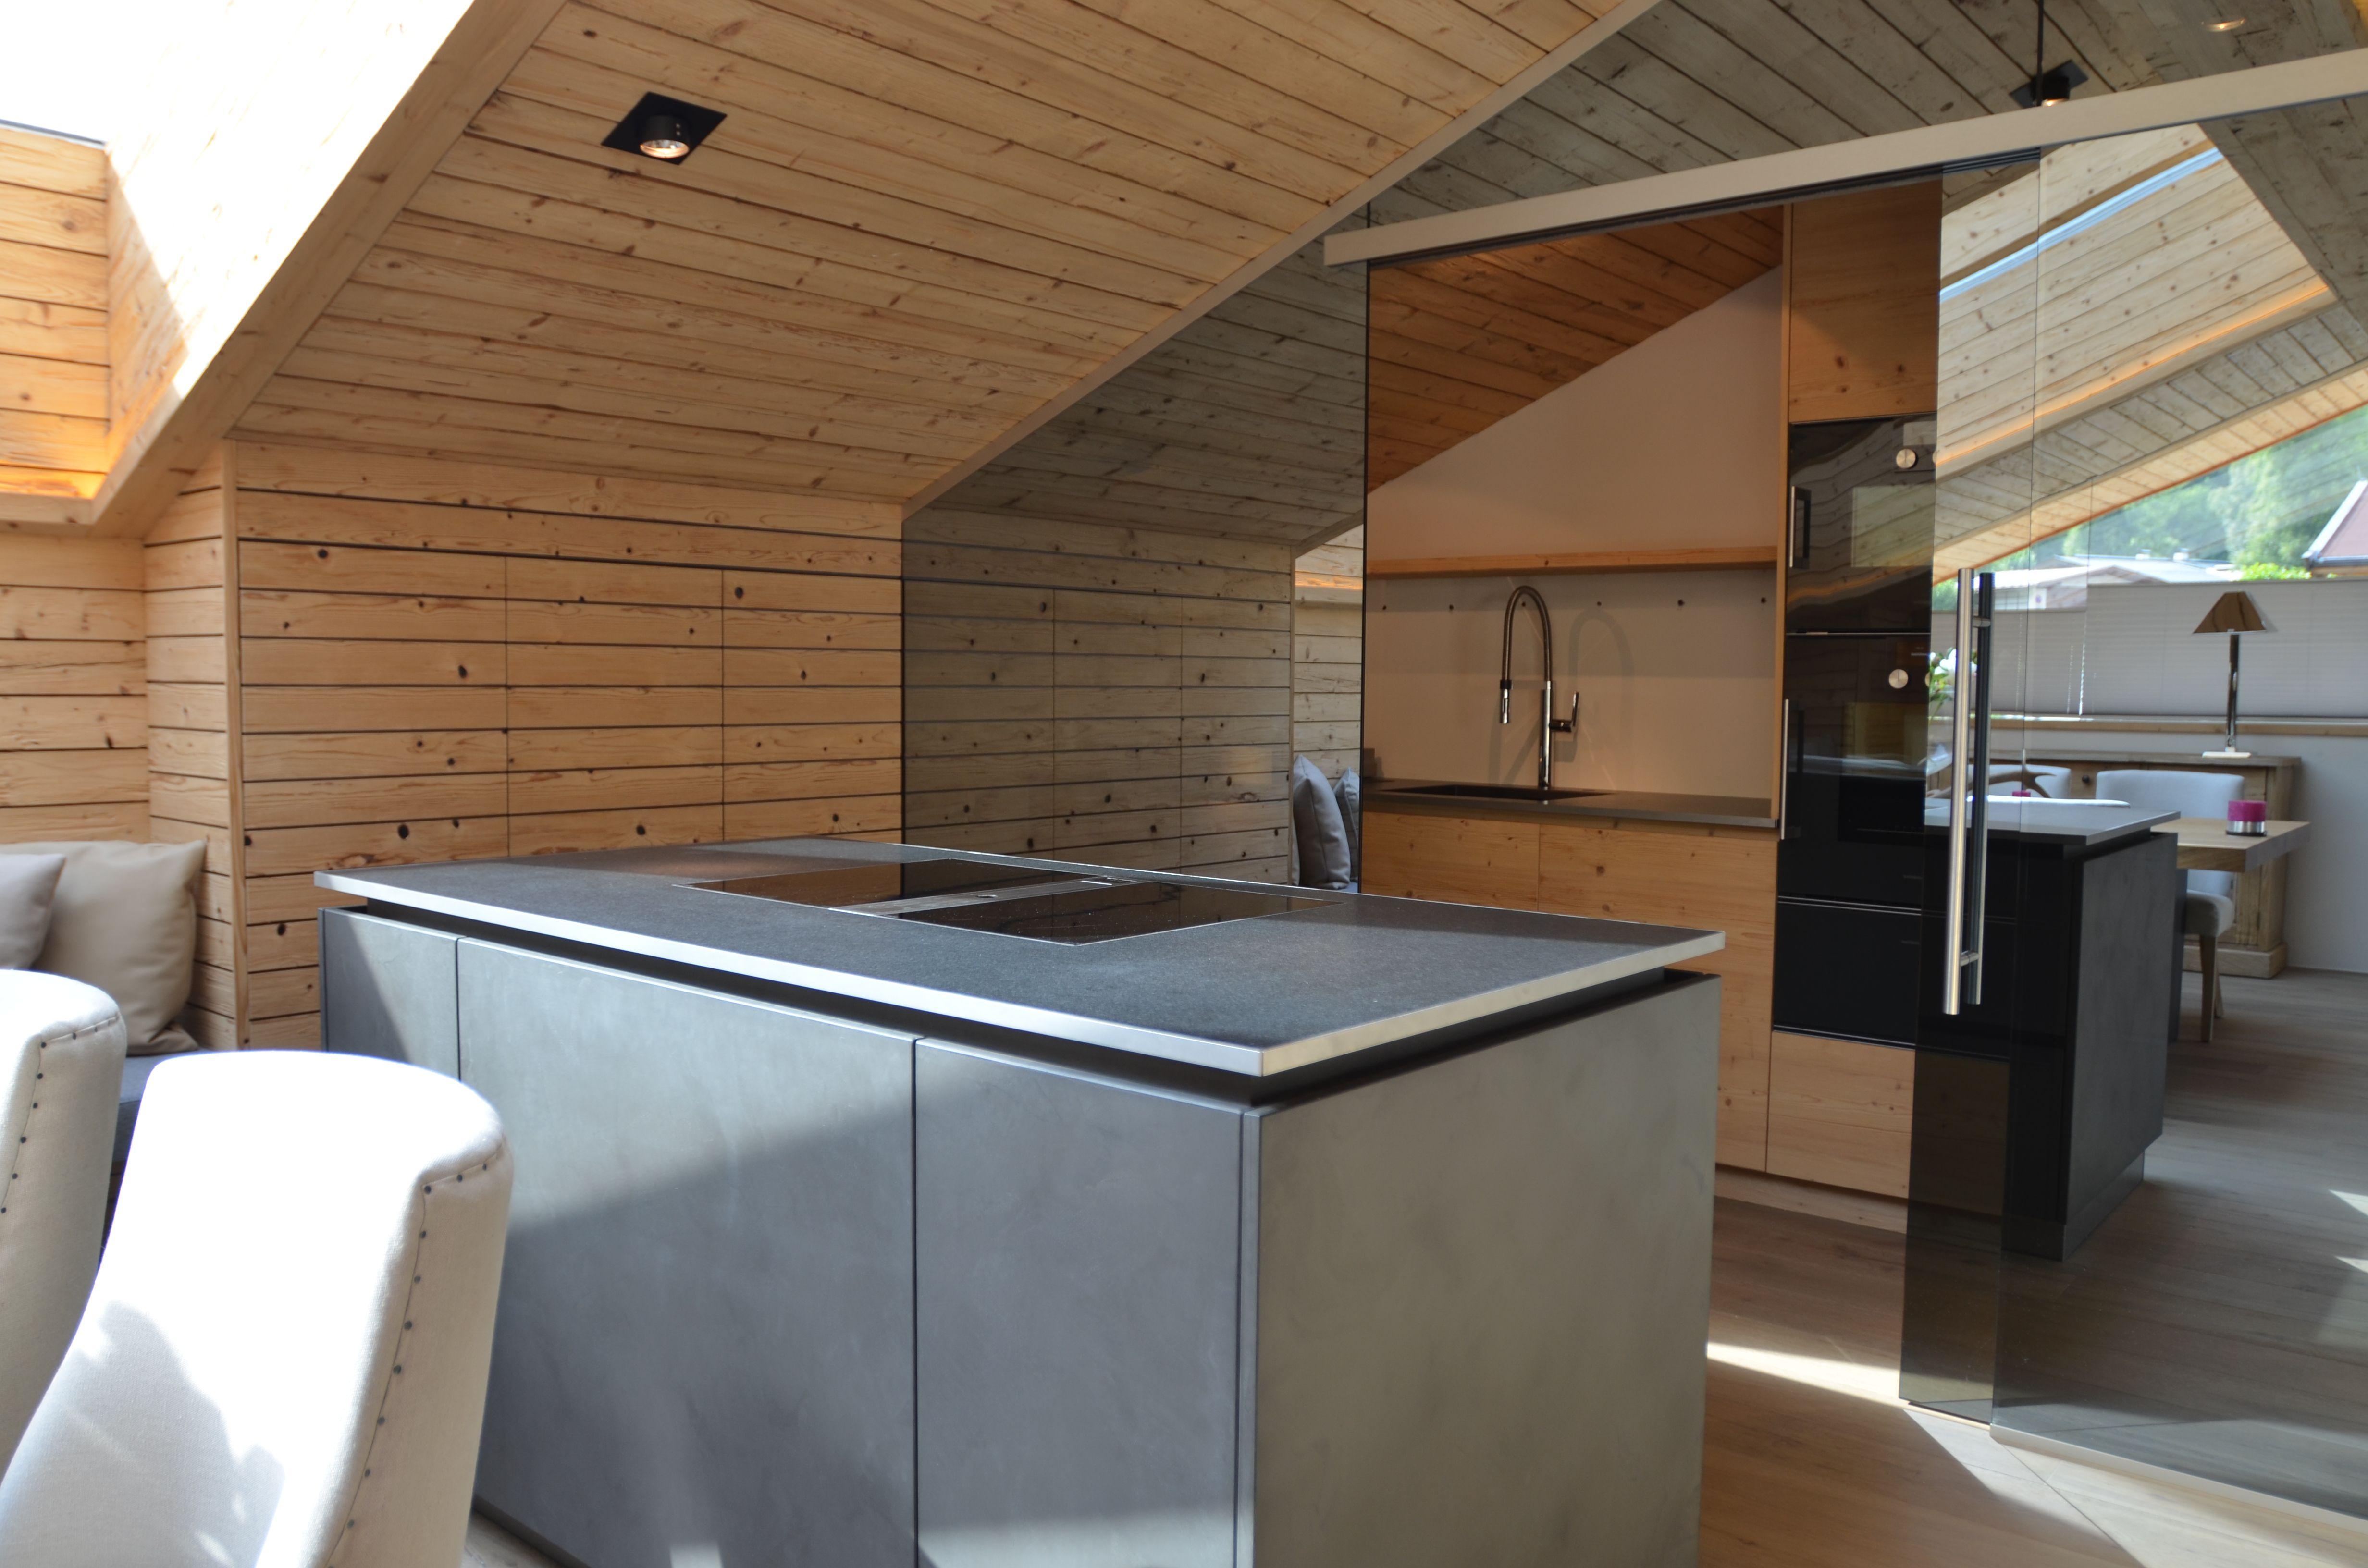 Küche Beton/ Prep-Kitchen/ Kochinsel/ Bora/ The Kitchen Club ...